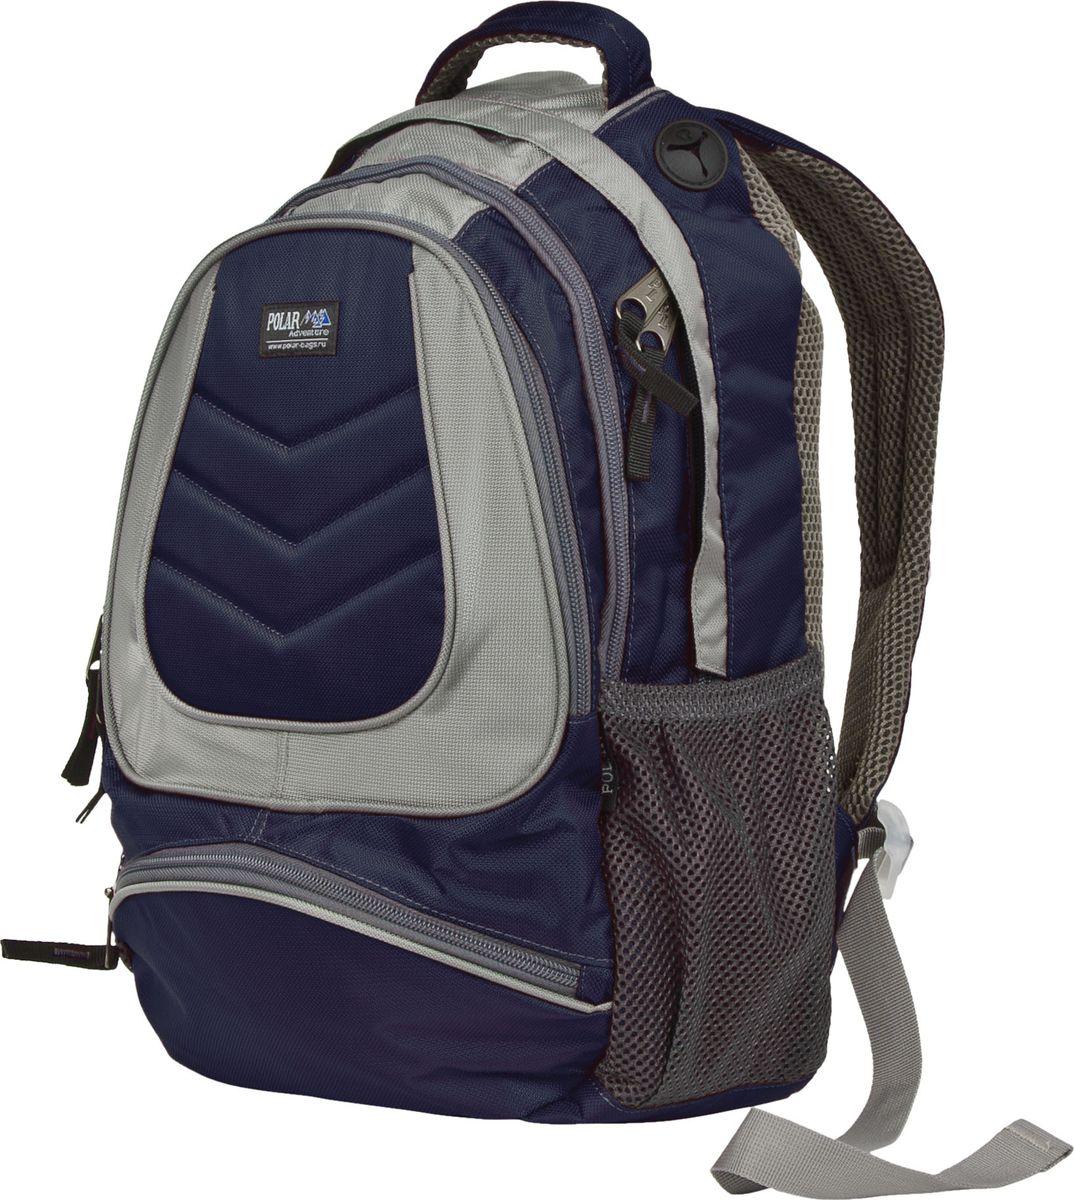 Рюкзак молодежный Polar, цвет: темно-синий, 14 л. ТК1009-04 рюкзак городской polar цвет синий 29 л п876 04